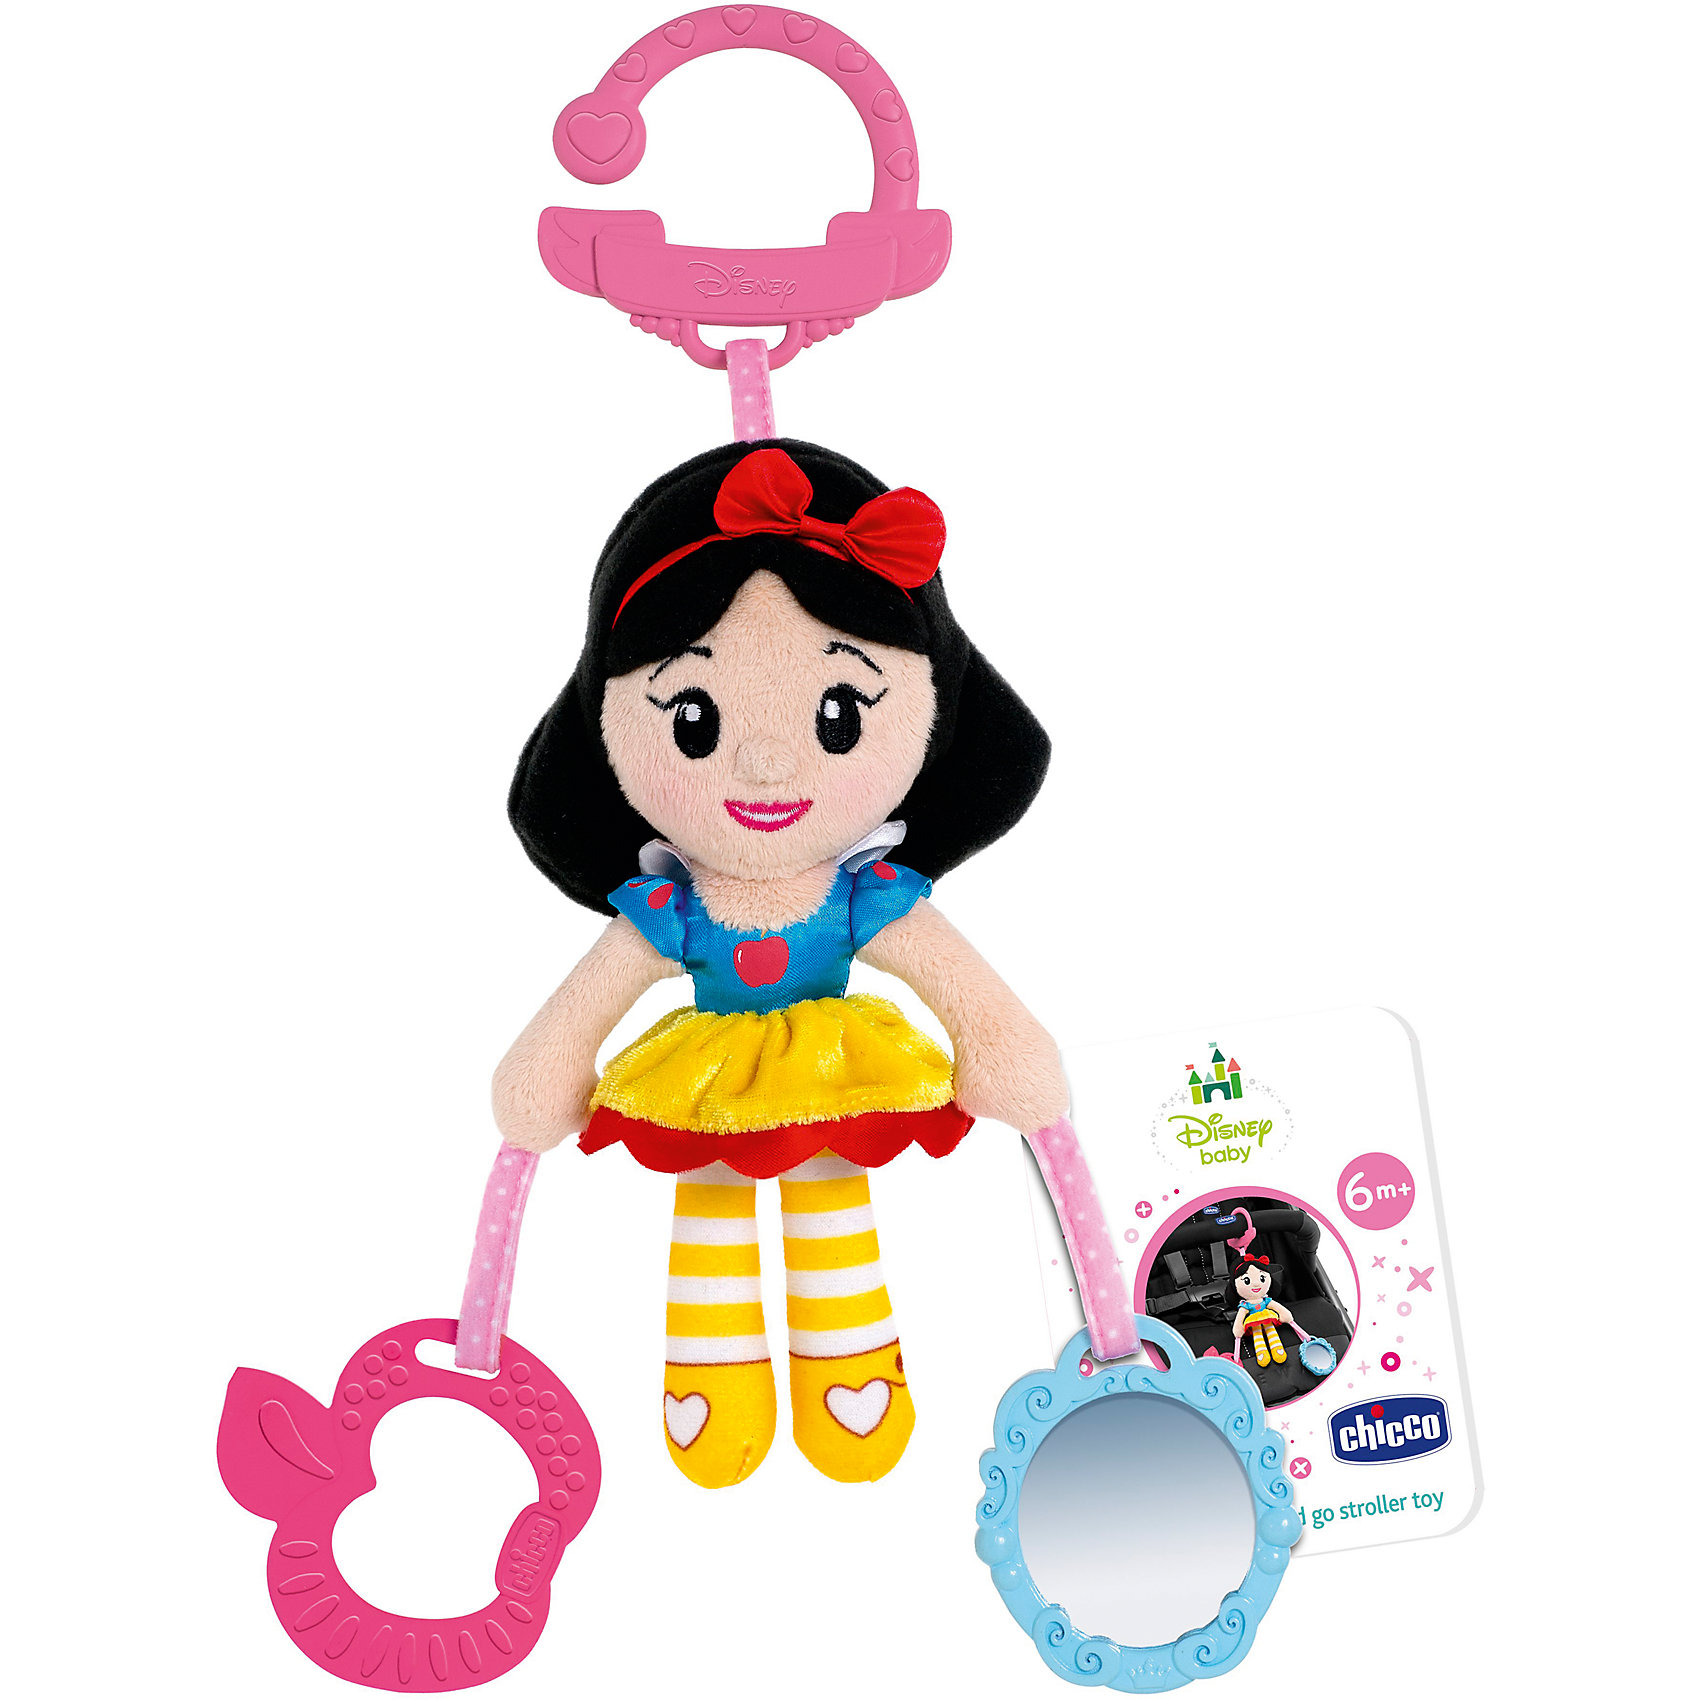 CHICCO Игрушка для коляски Белоснежка, Disney, CHICCO игрушка подвеска chicco игрушка мягкая для коляски золушка